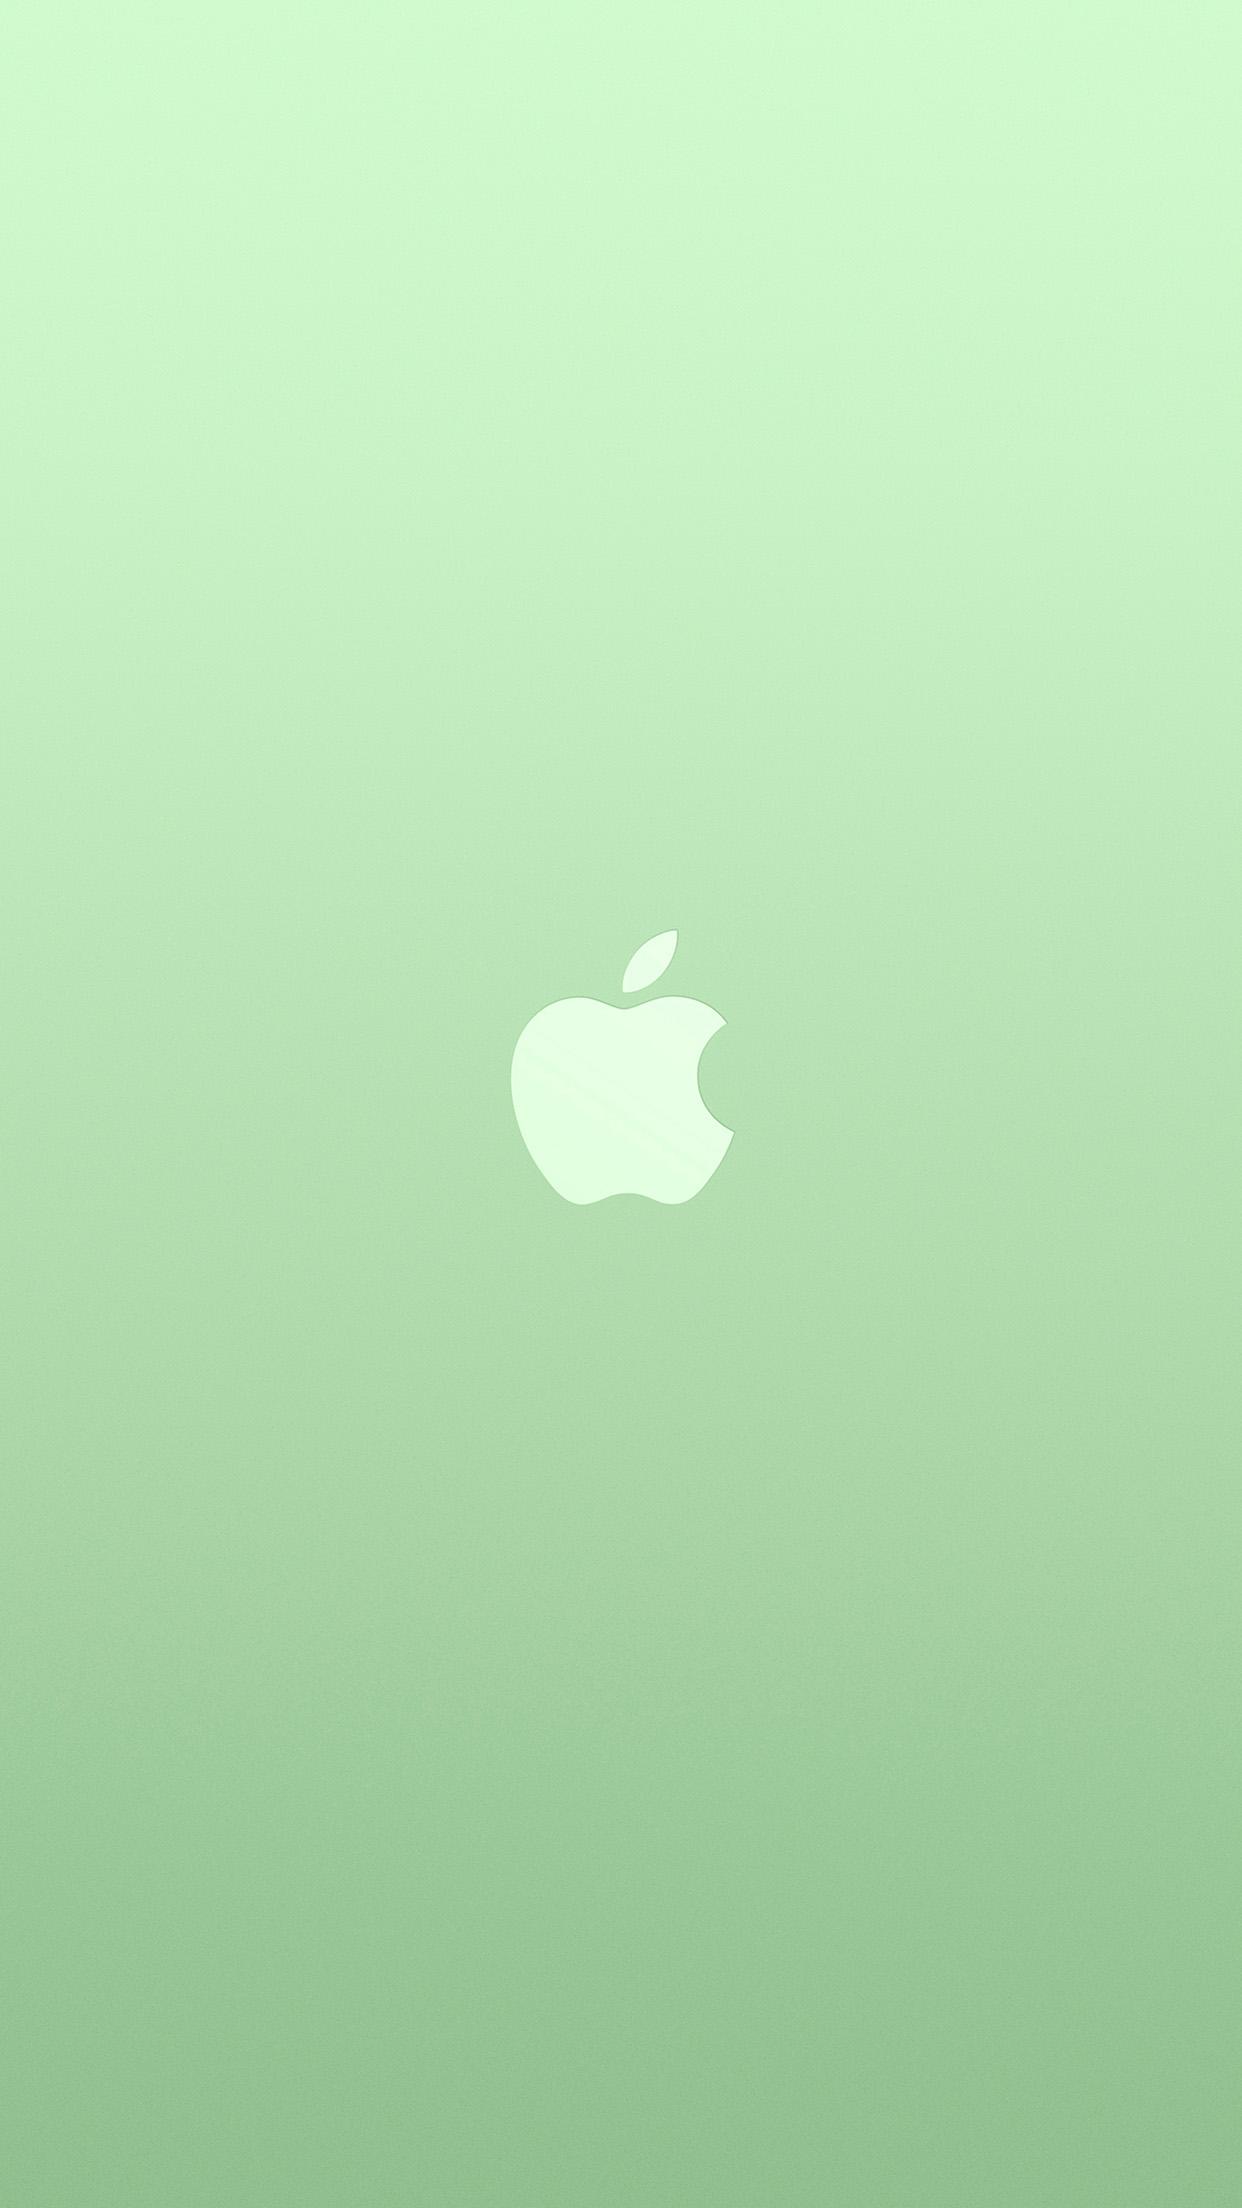 Logo Apple Green White Minimal Illustration Art Color Android